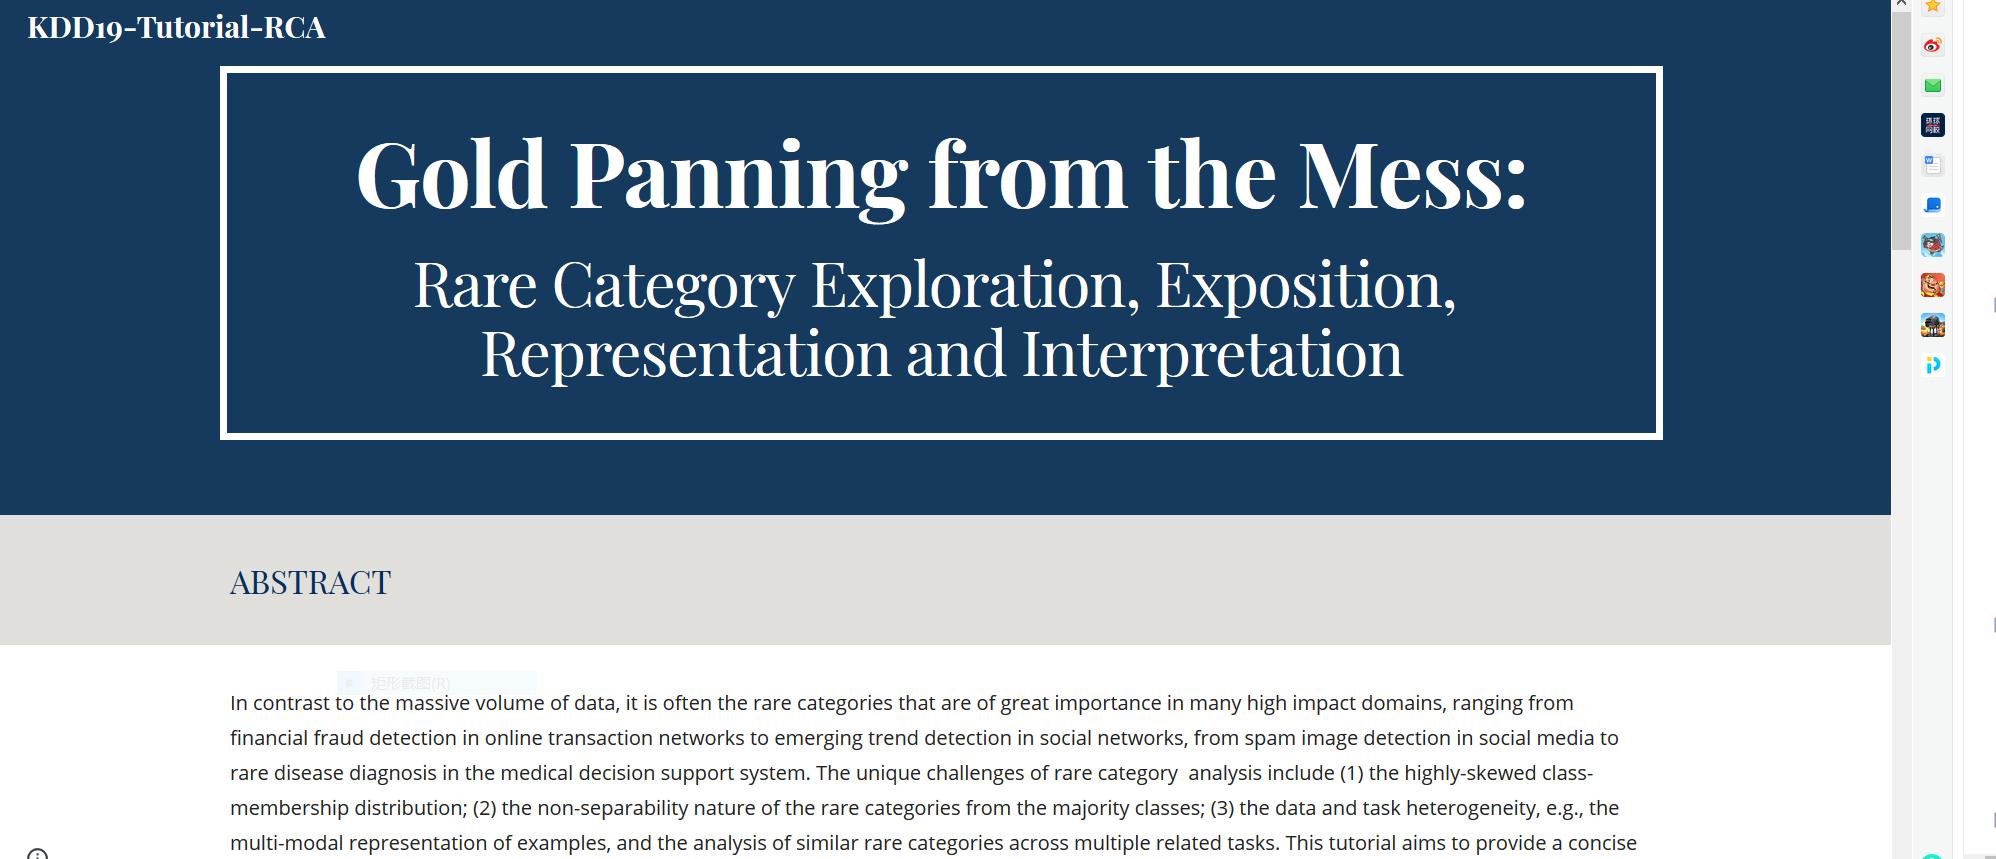 【KDD2019|讲座推荐】从混乱中淘金:稀有类别的探索,展示,表示和解释:Gold Panning from the Mess: Rare Category Exploration, Exposition, Representation and Interpretation